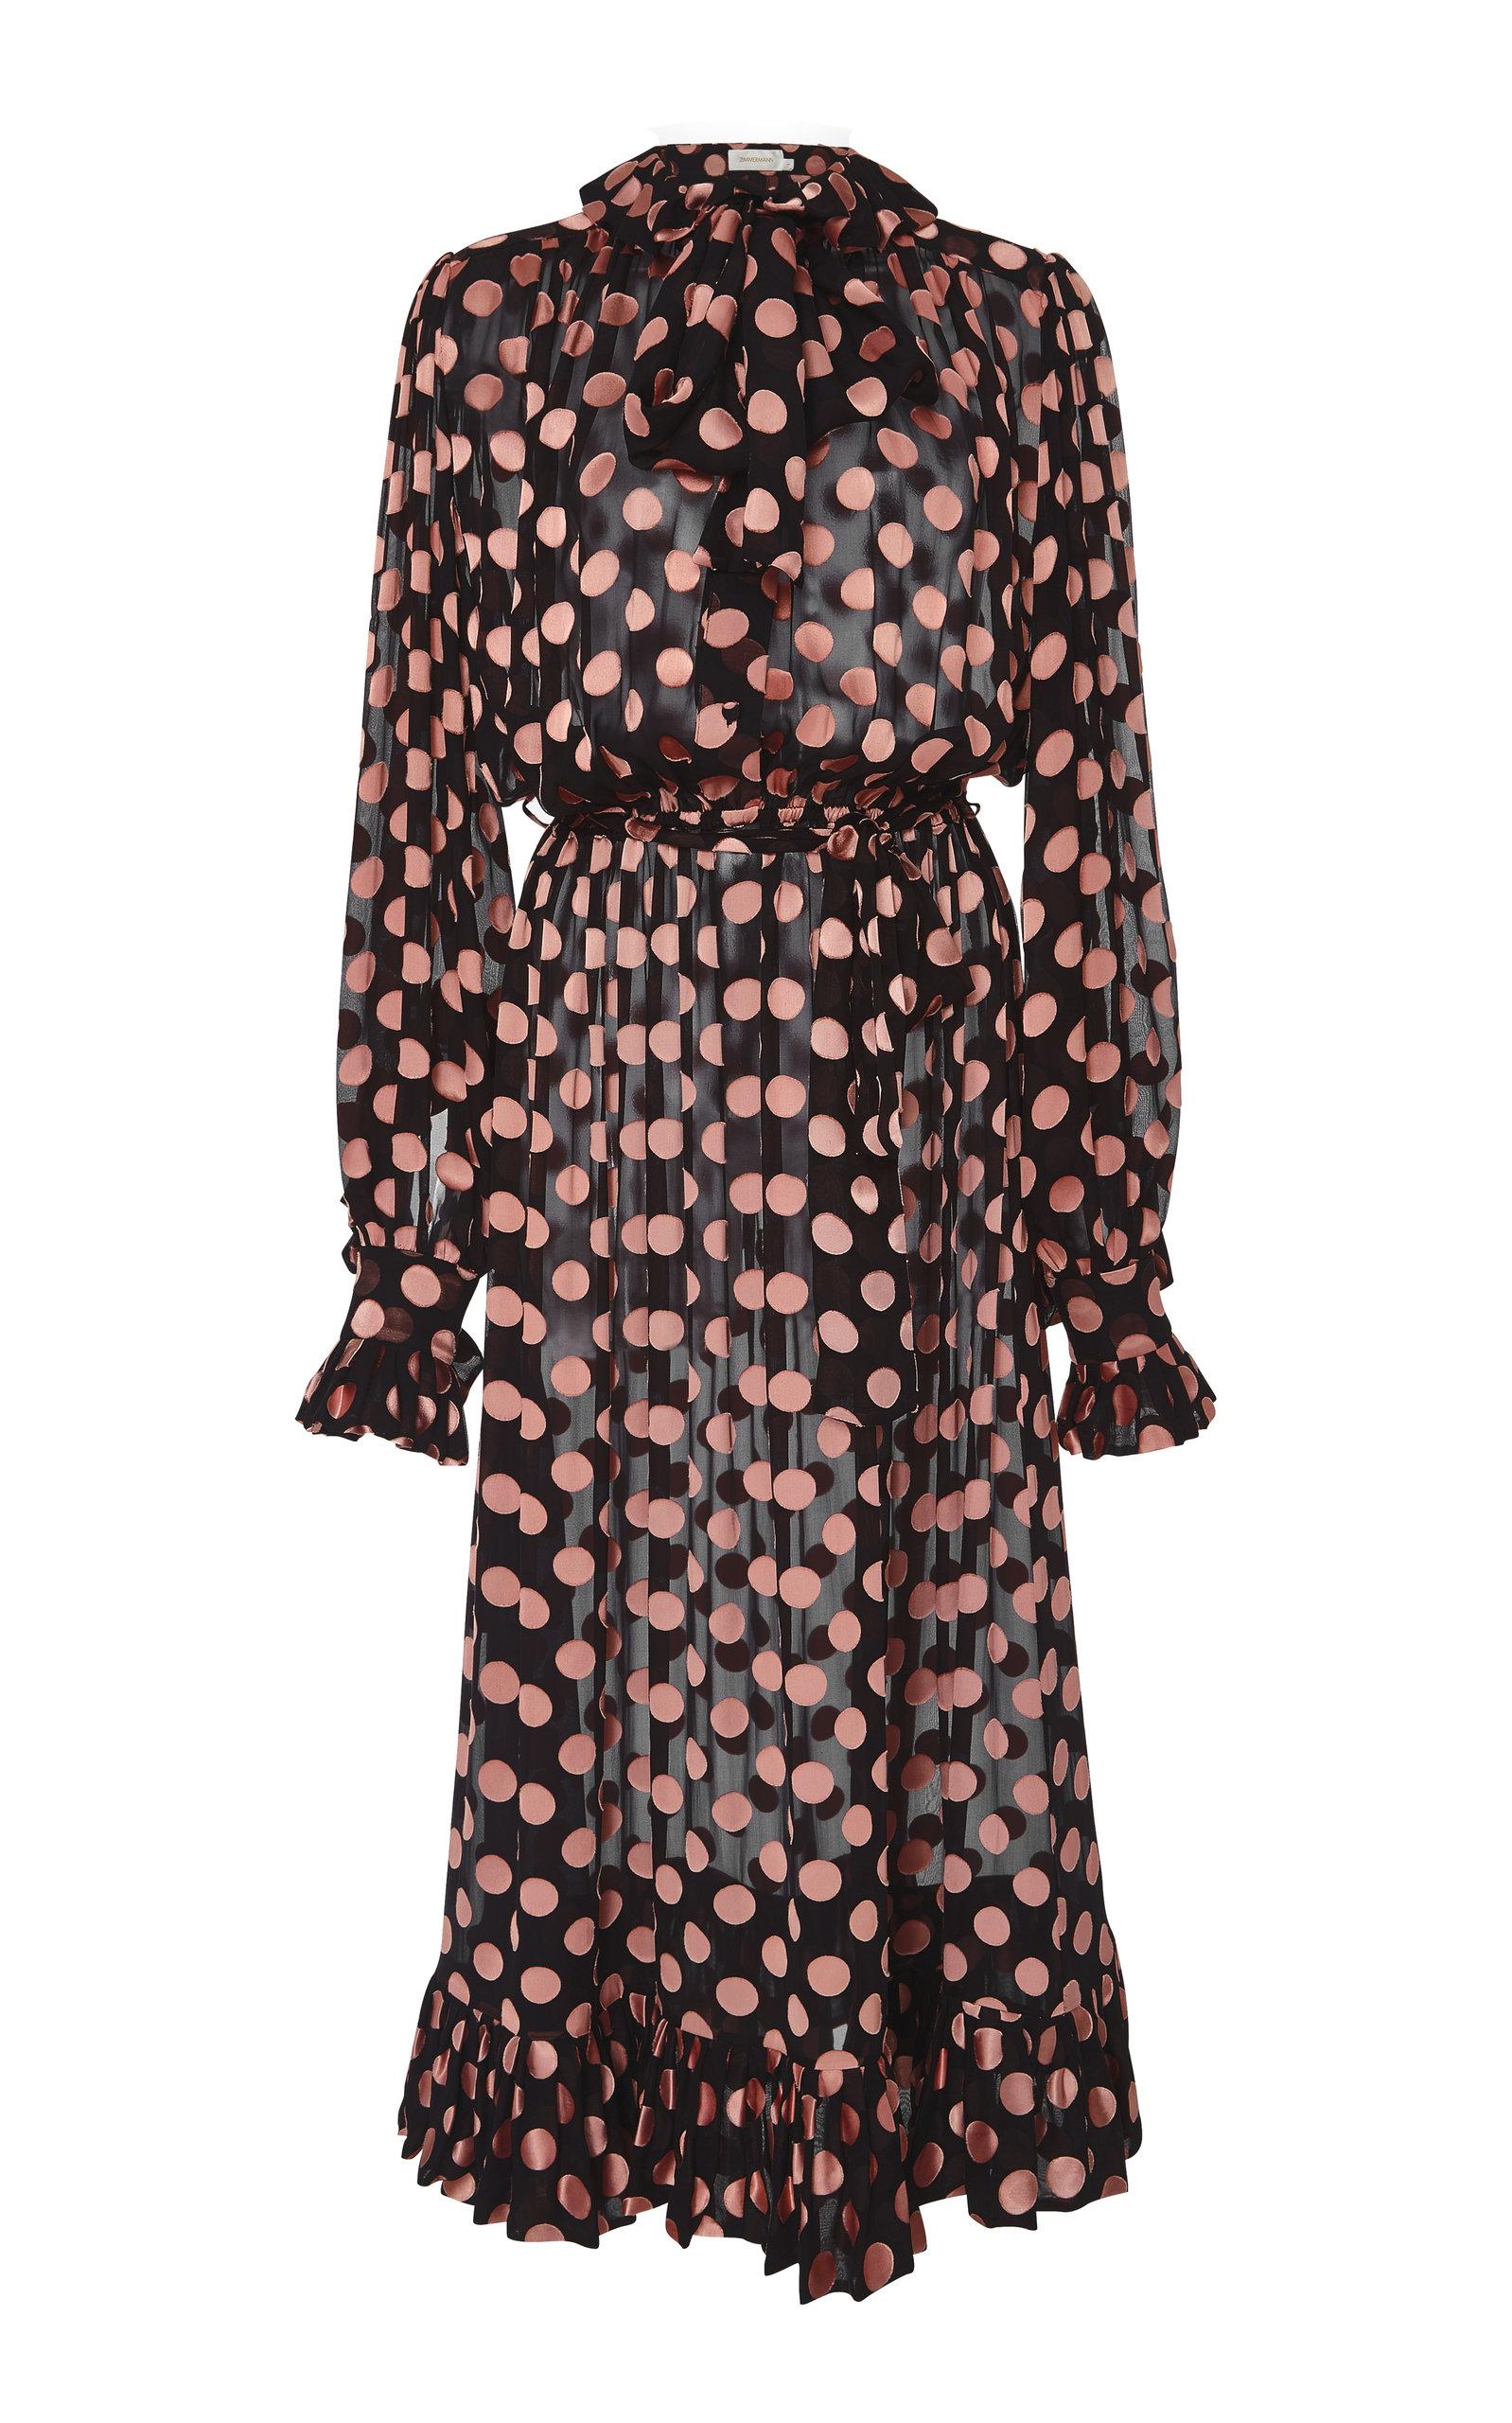 Polka-Dot Devoré Silk-Blend Chiffon Dress in Black